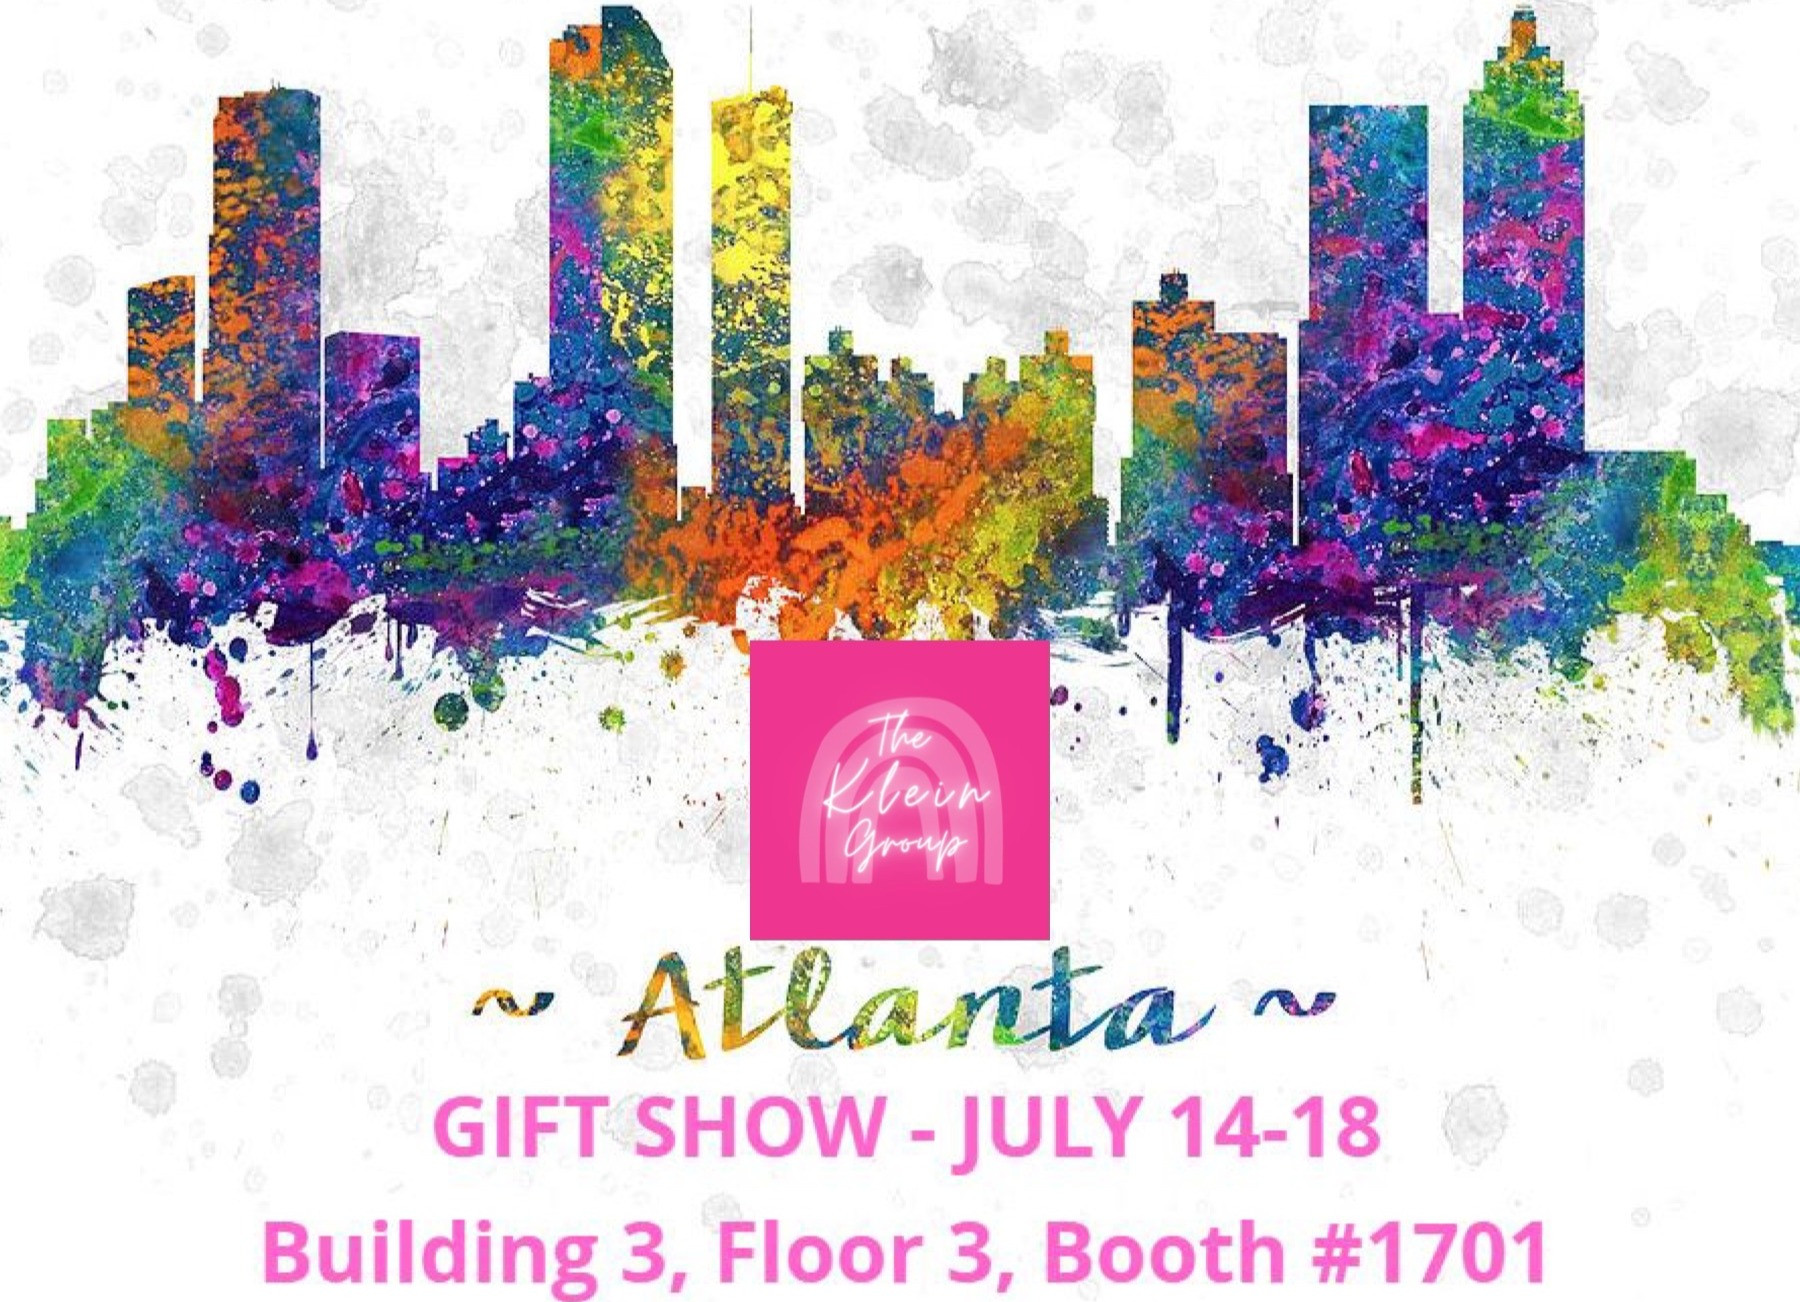 Atlanta Gift Show July 14-18 Booth #1701